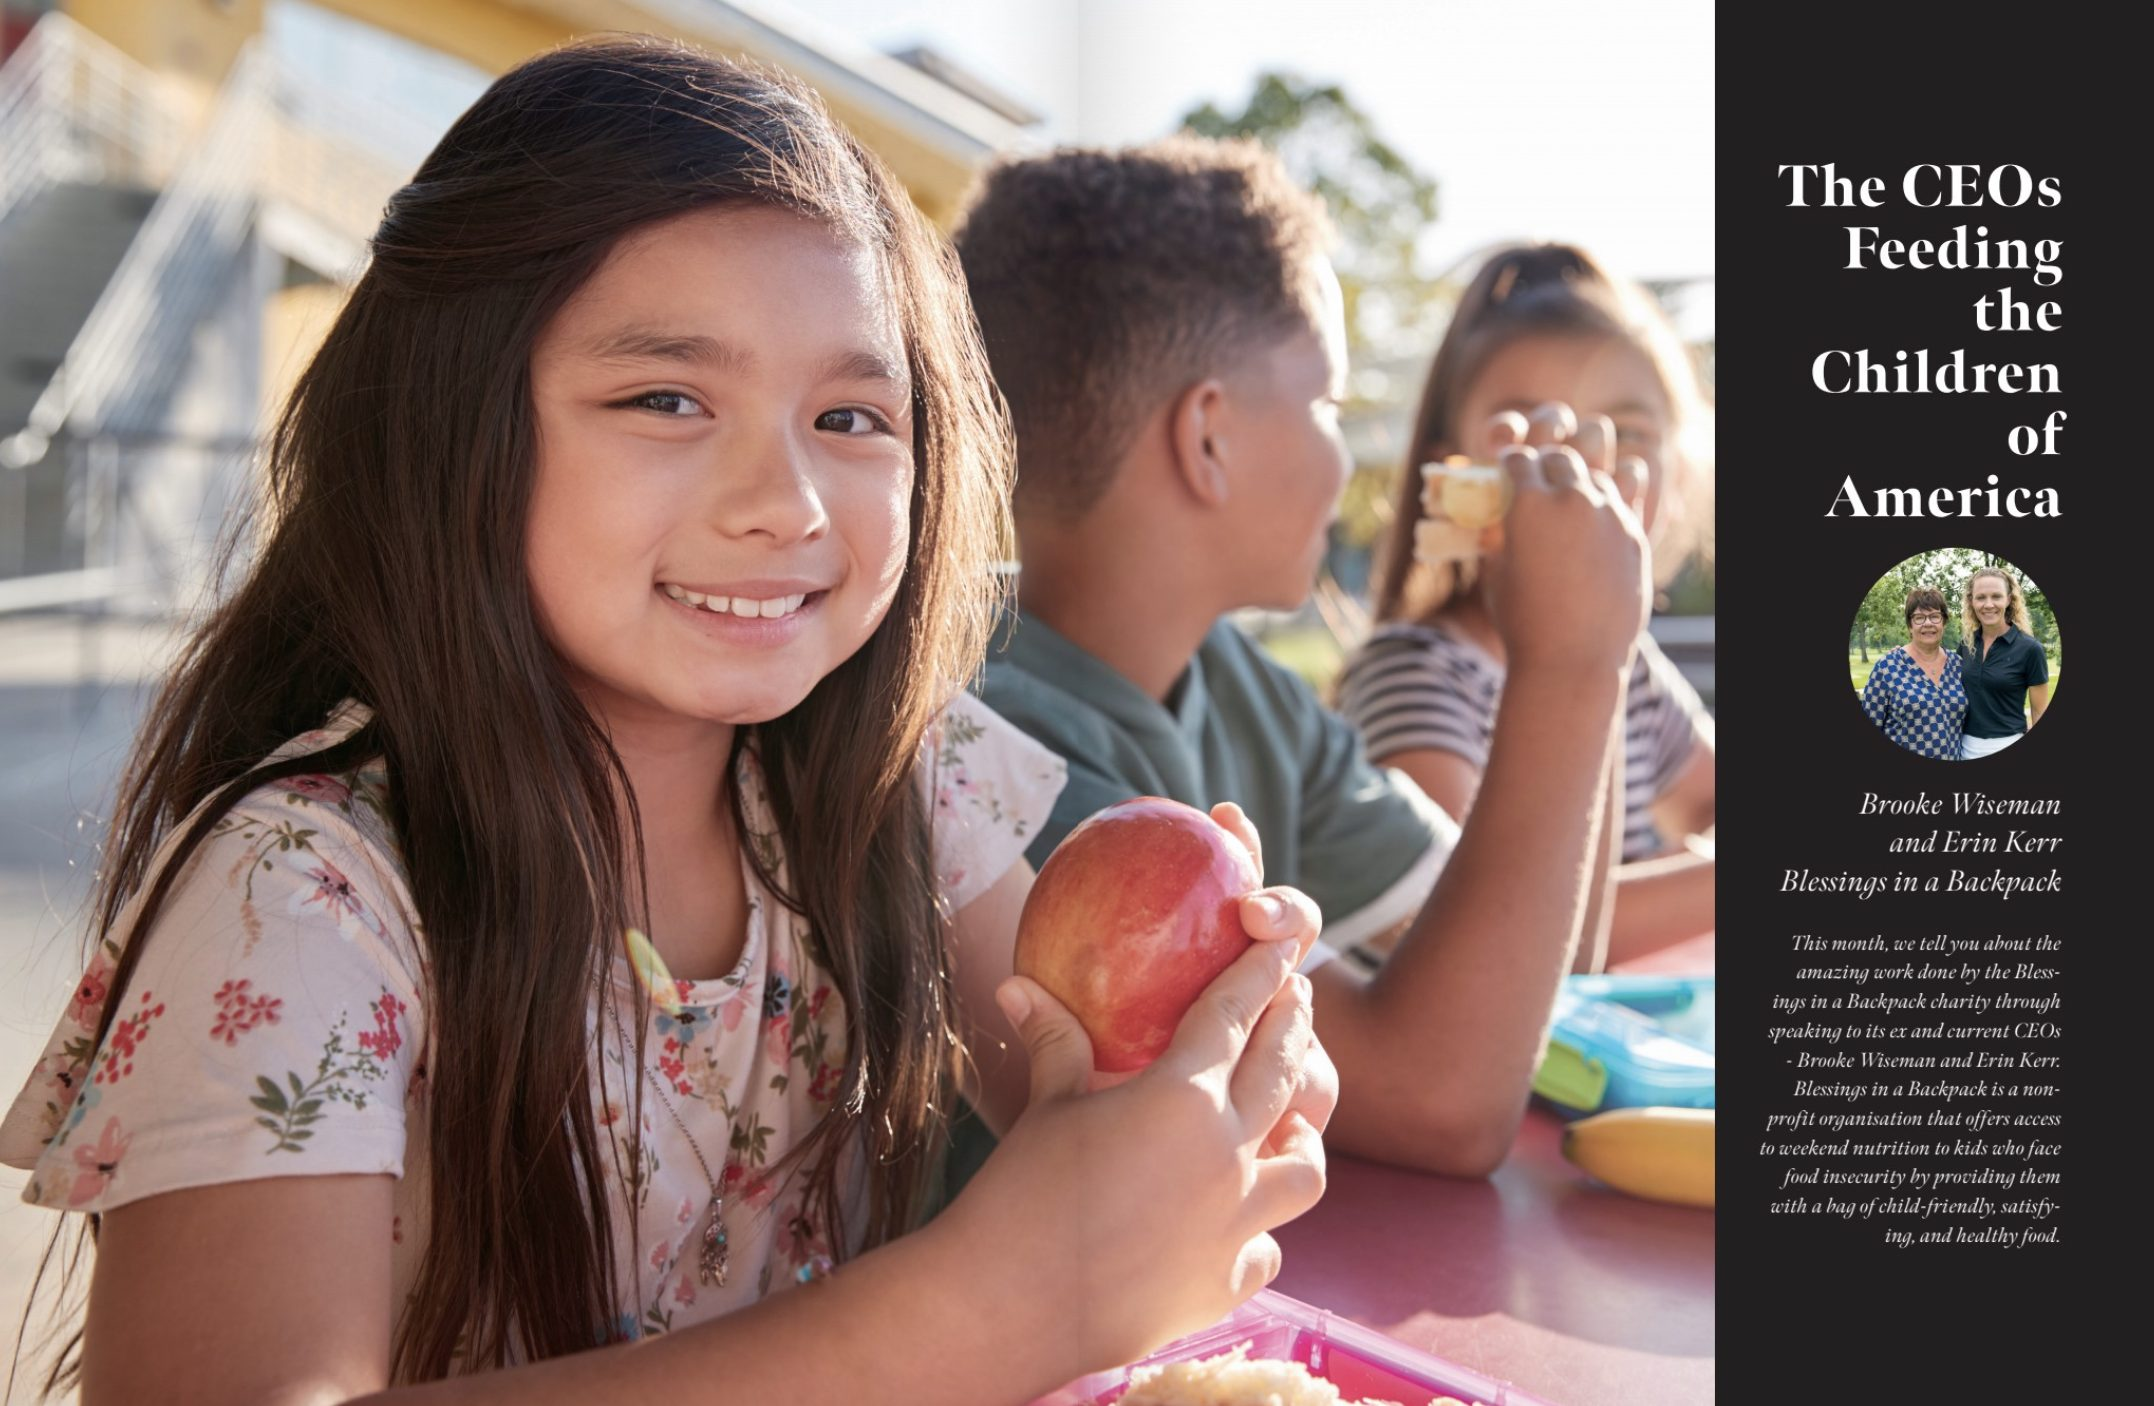 The CEOs feeding the children of America